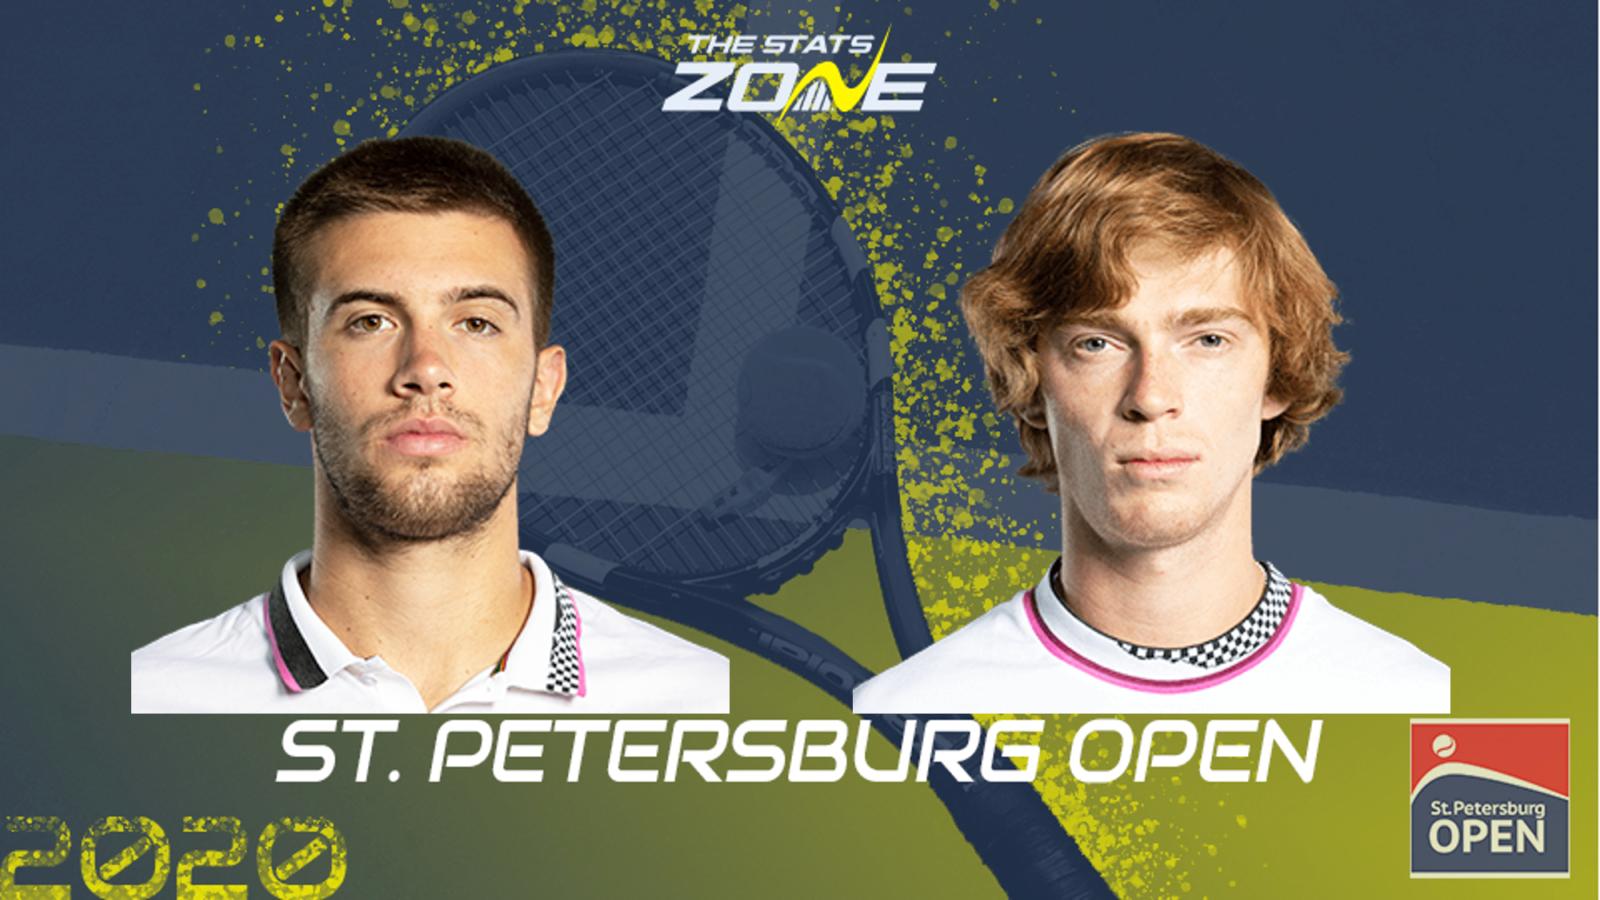 Denis Shapovalov and Milos Raonic advance to St. Petersburg Open semi-finals